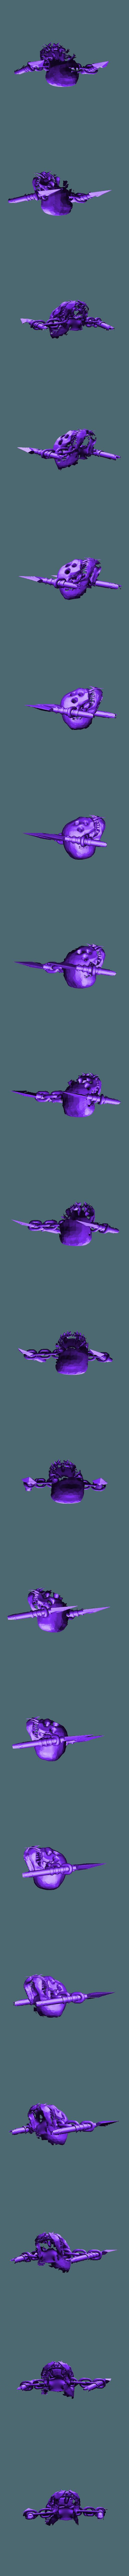 Aztec_Armiger_Xeno_skull_trophy.stl Download free STL file Aztec Armor Bearer  - Conversion Kit • Model to 3D print, ErikTheHeretek